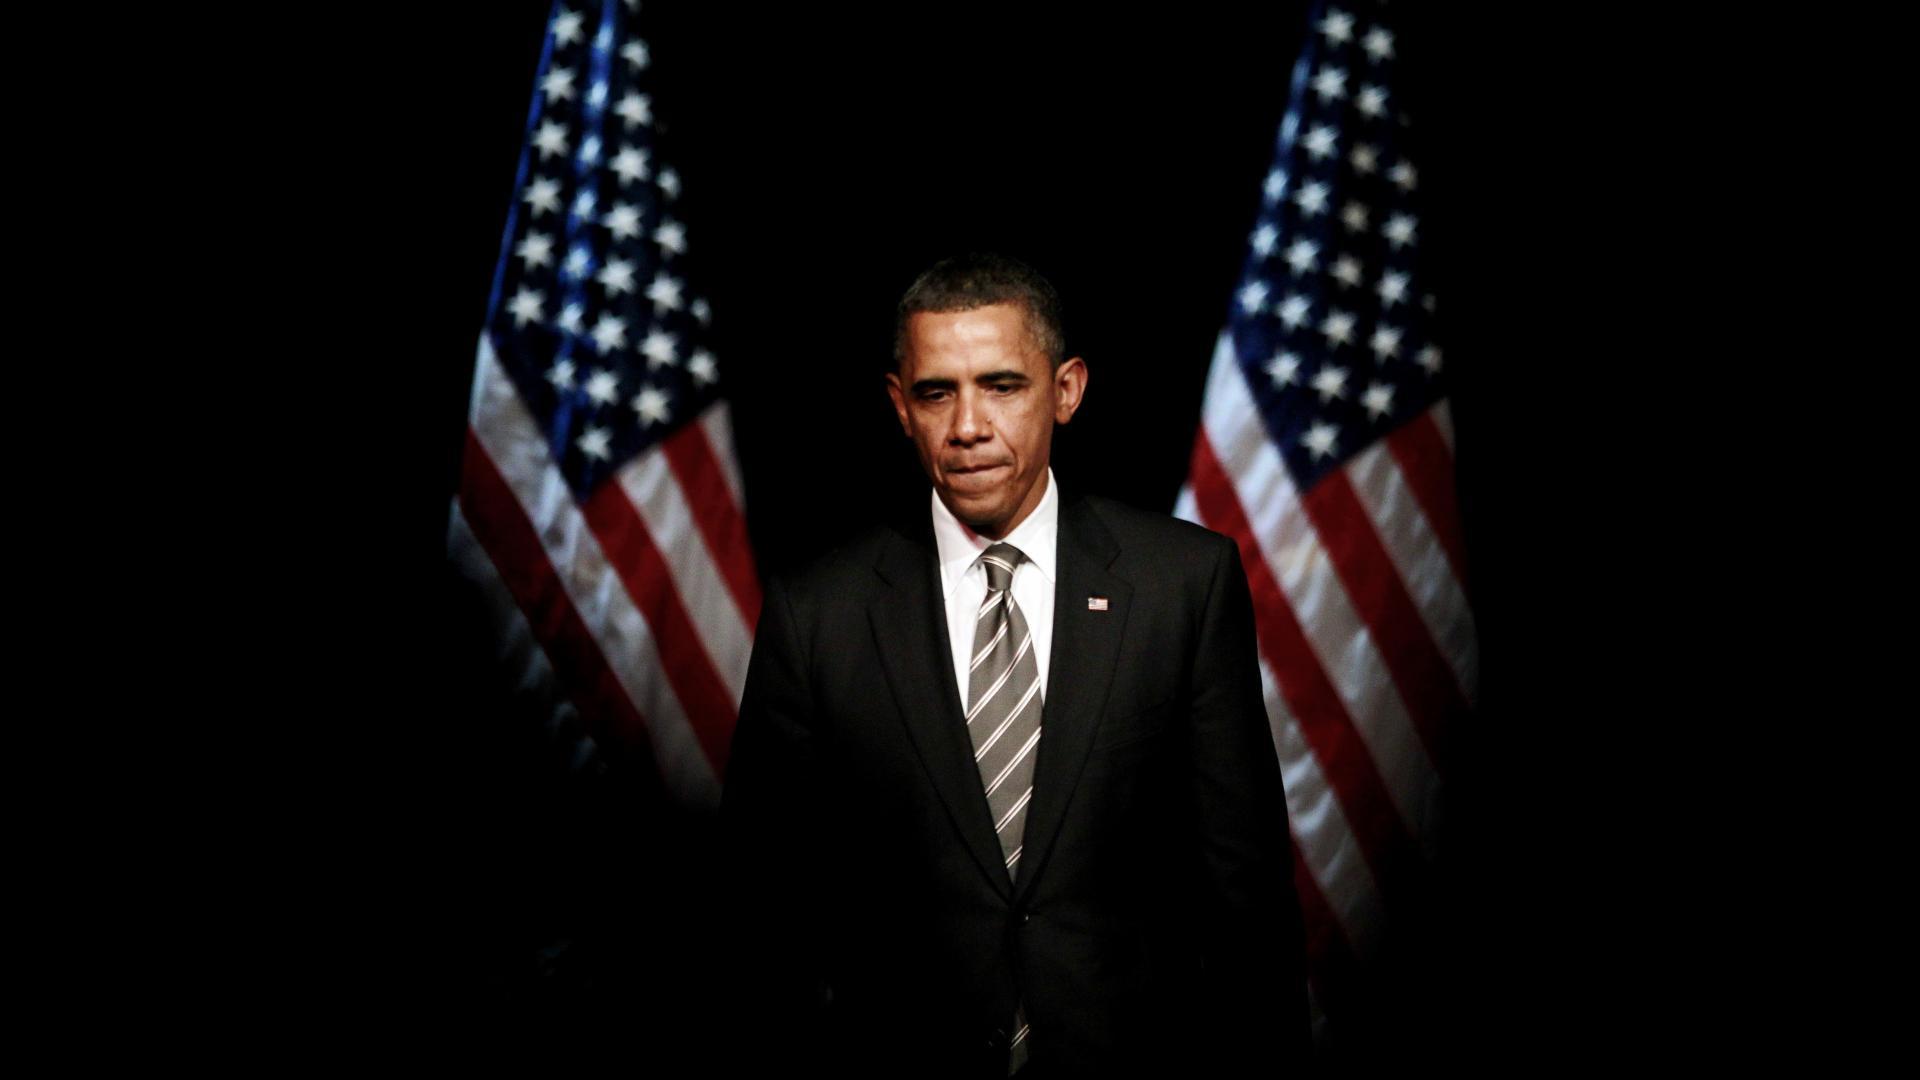 Barack Obama Presiden USA Wallpapers 1920x1080